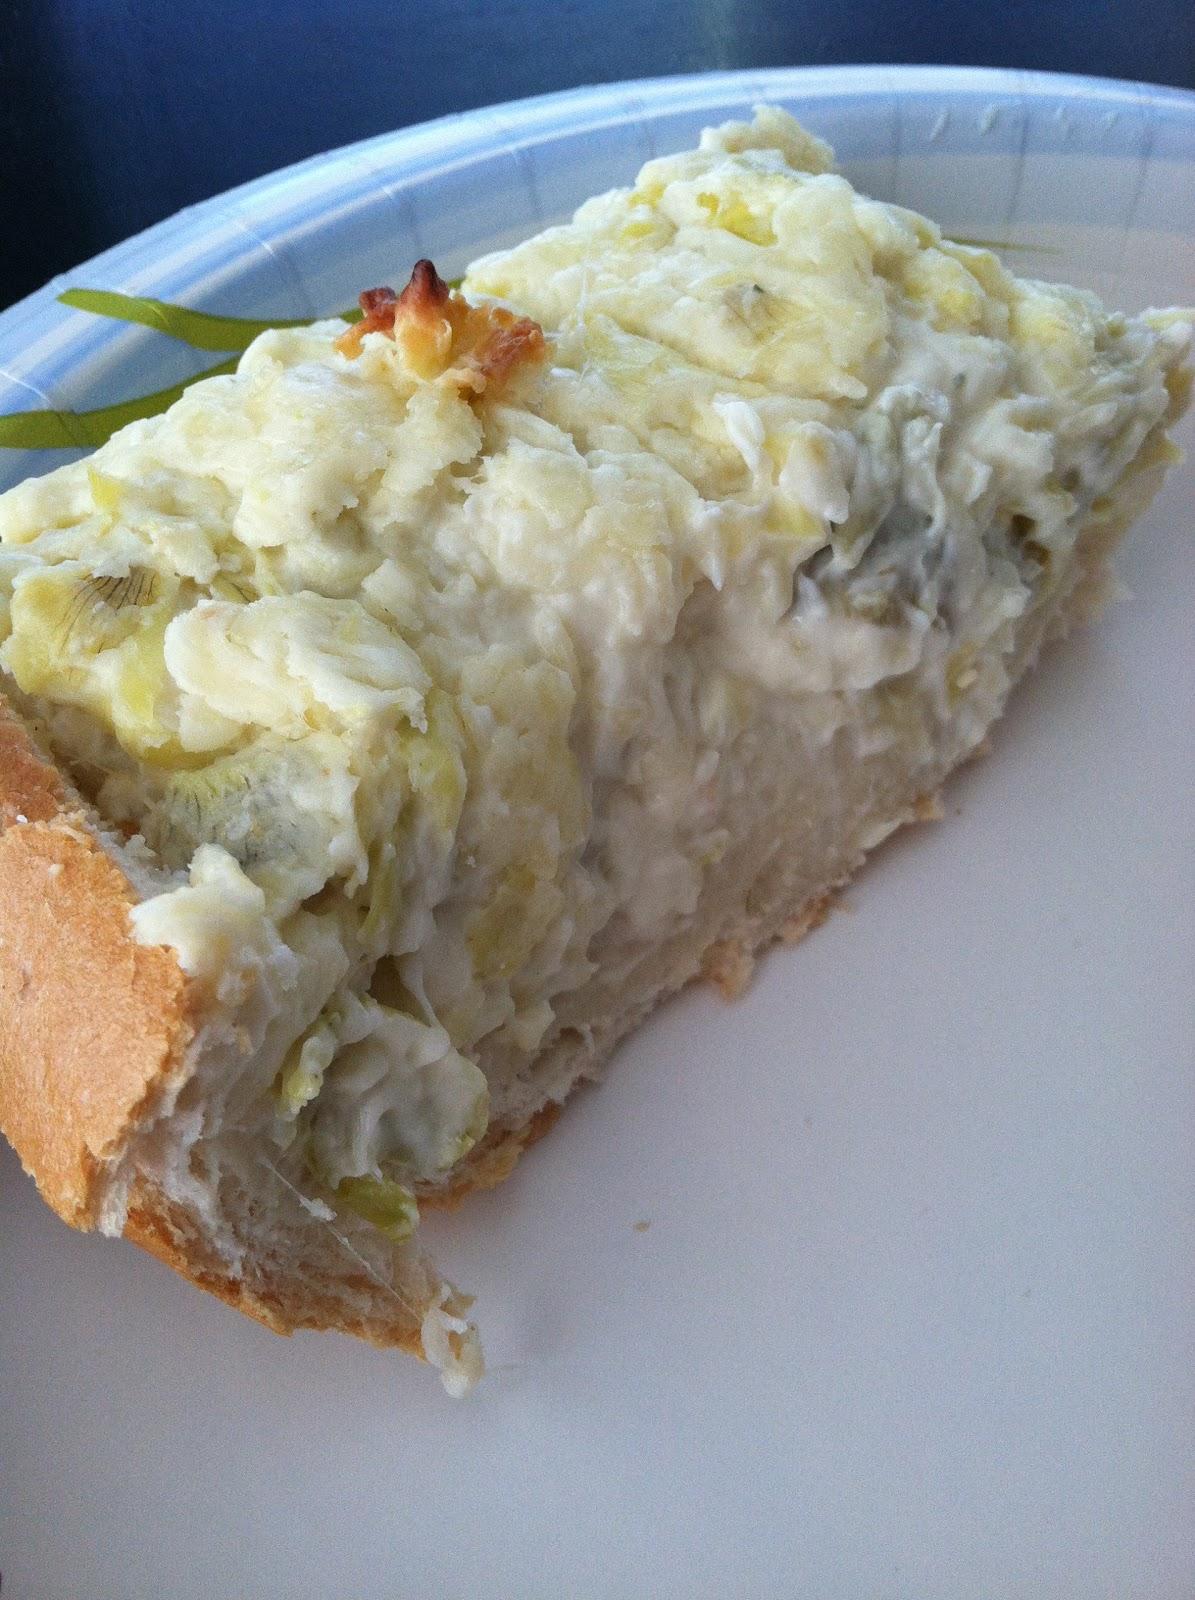 7CooksInAKitchen: Cheesy Artichoke Bread